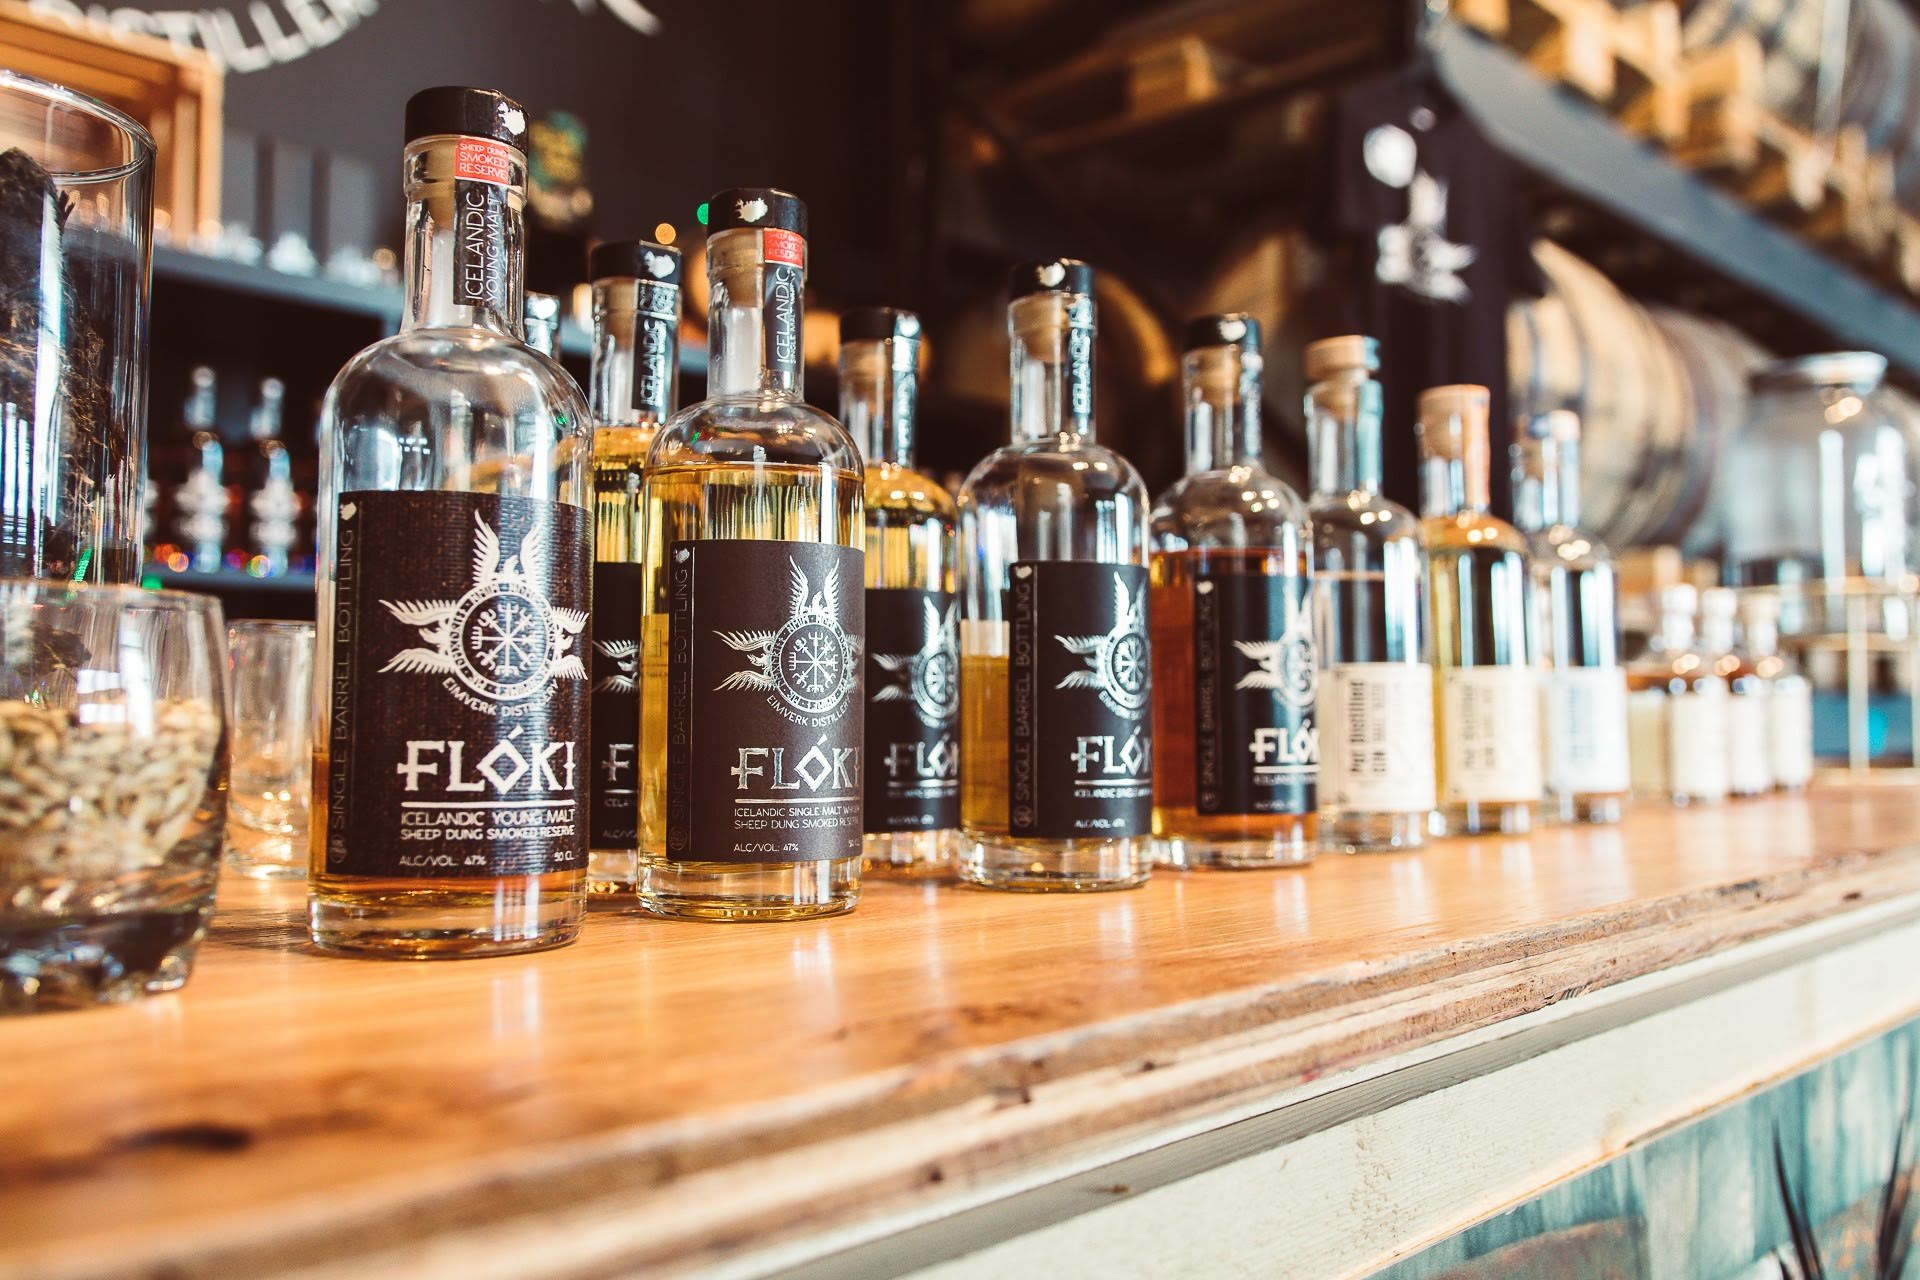 Numerous whisky bottles